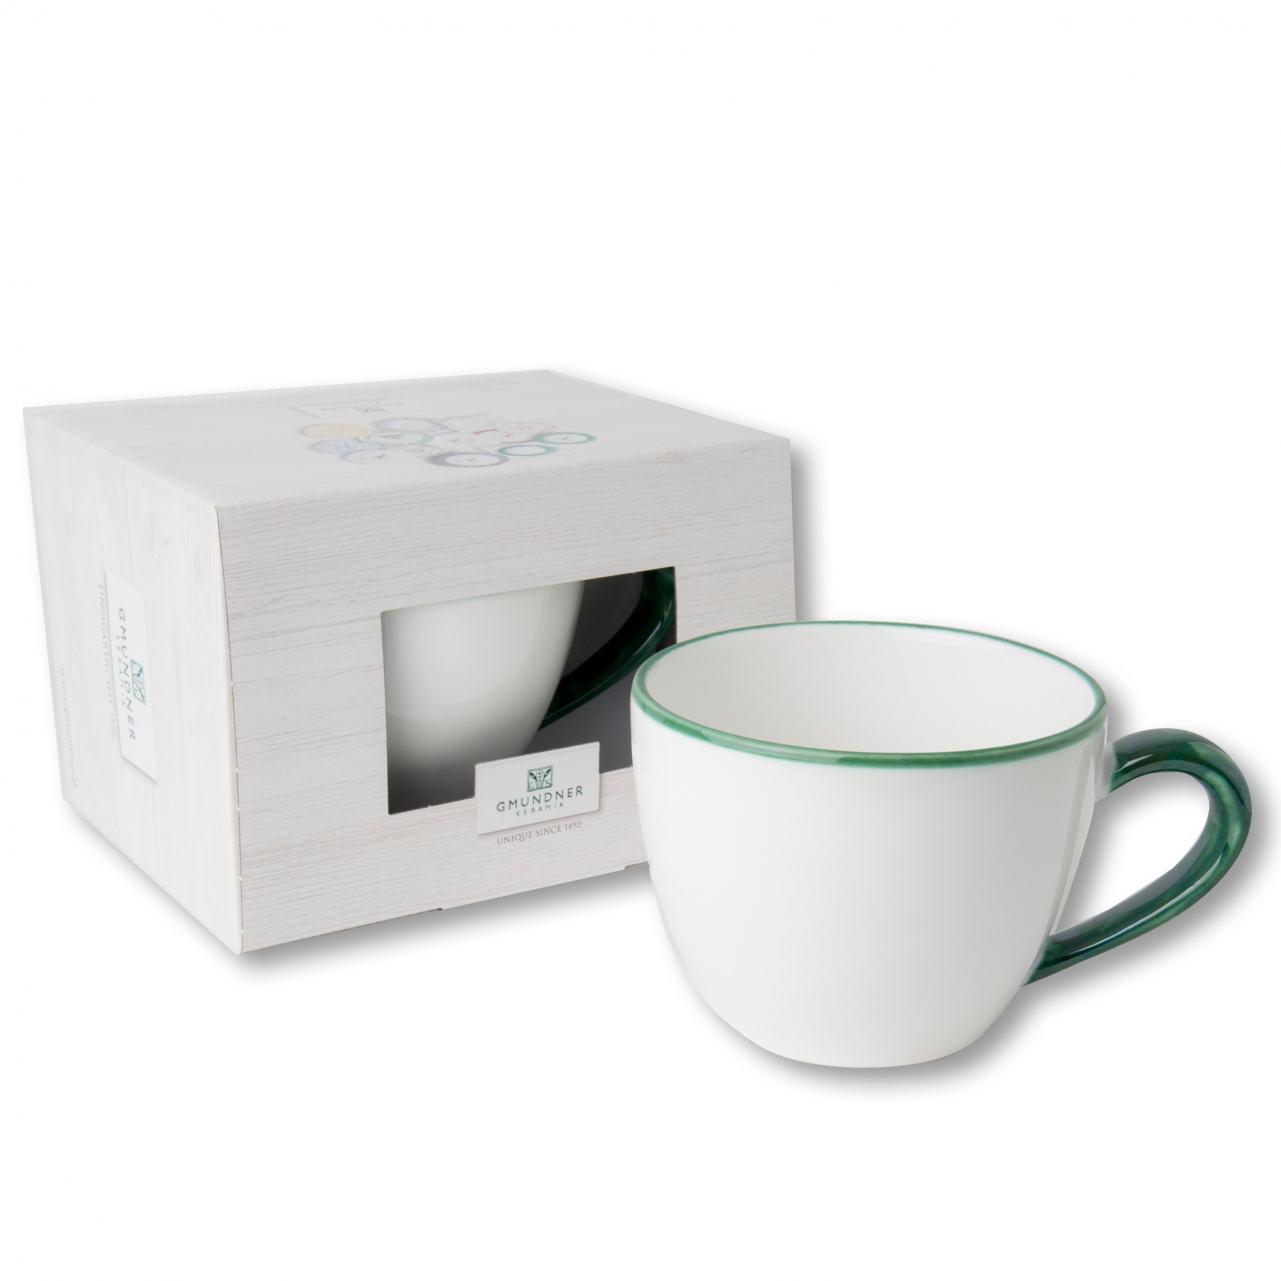 Gmundner Keramik Grüner Rand Teetasse Maxima 0.4 L im Karton